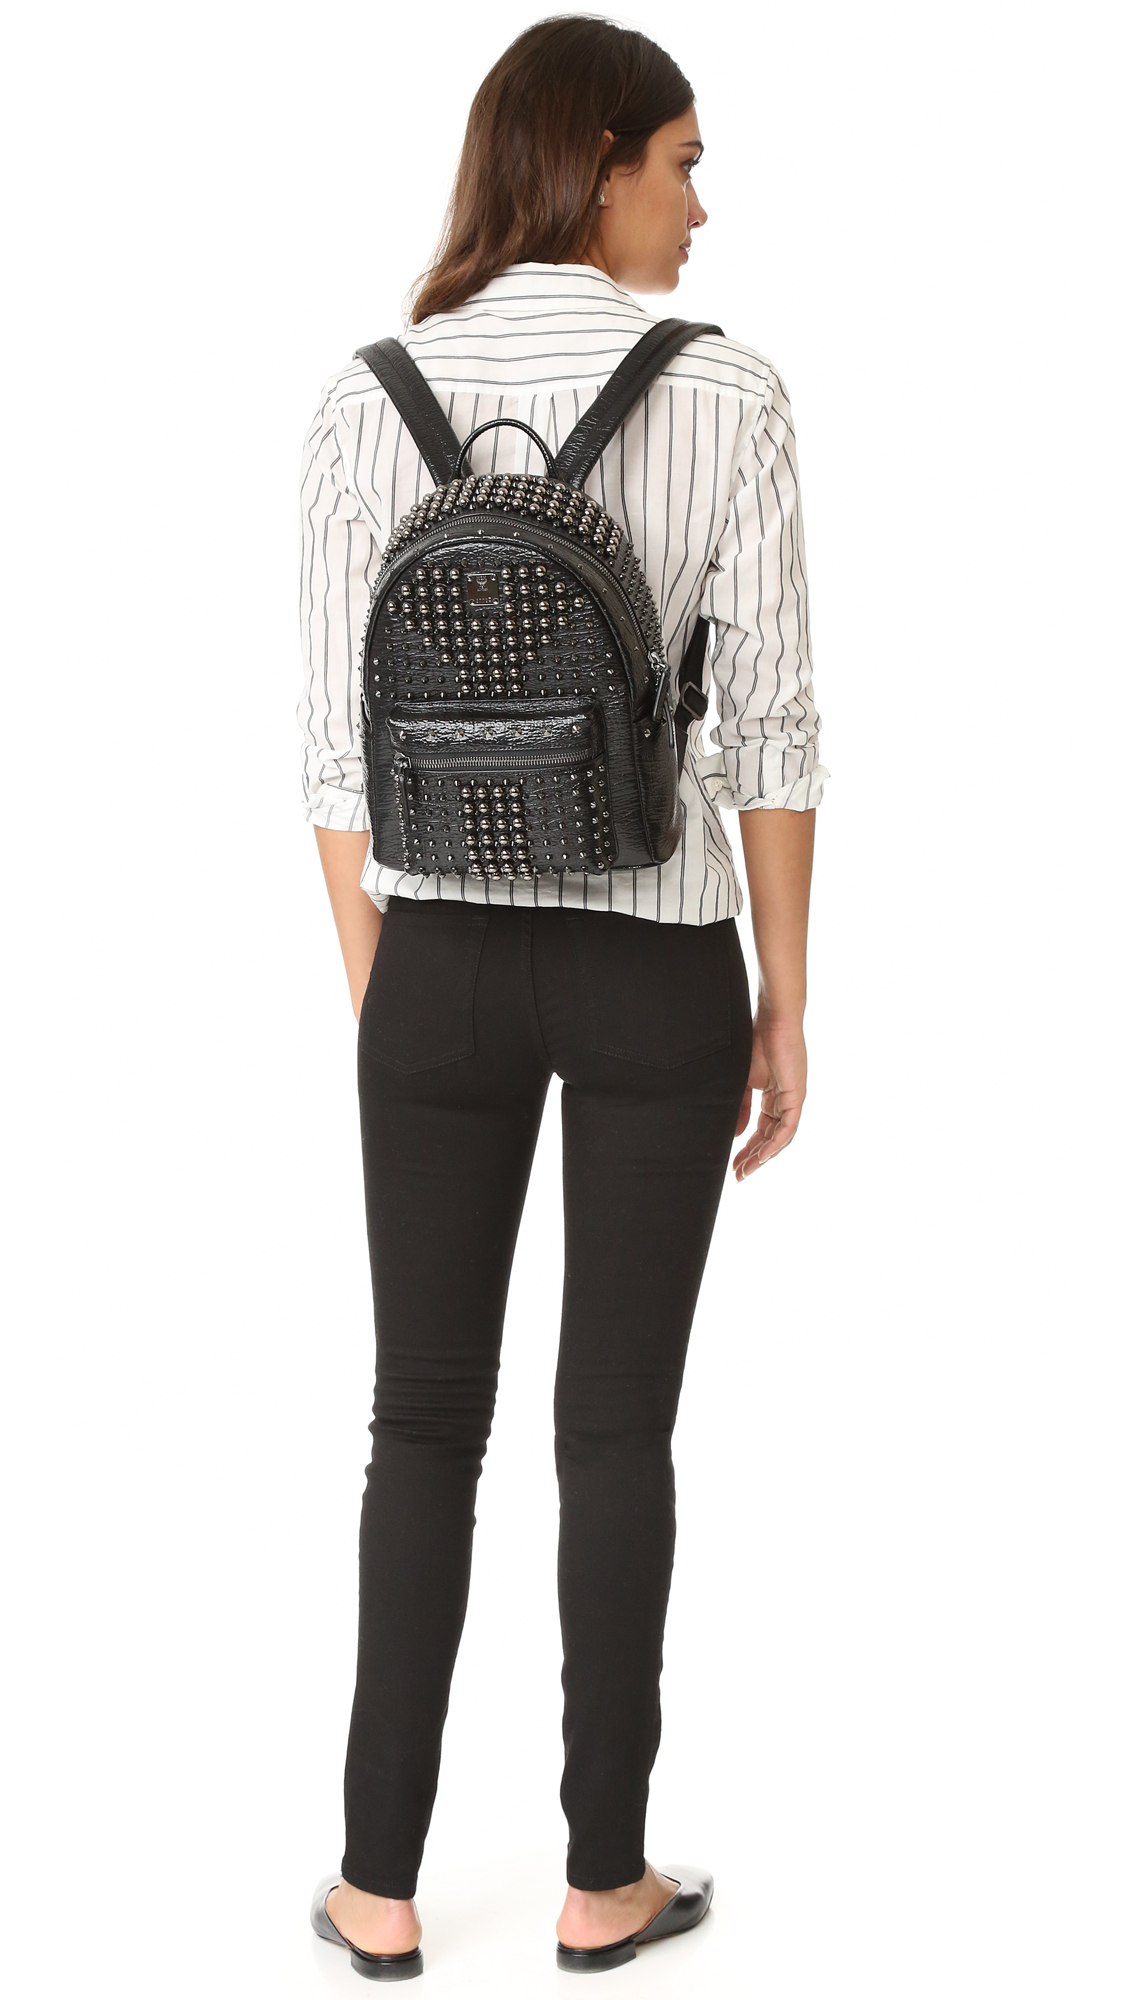 0fab13deb77 MCM Stark Pearl Stud Backpack